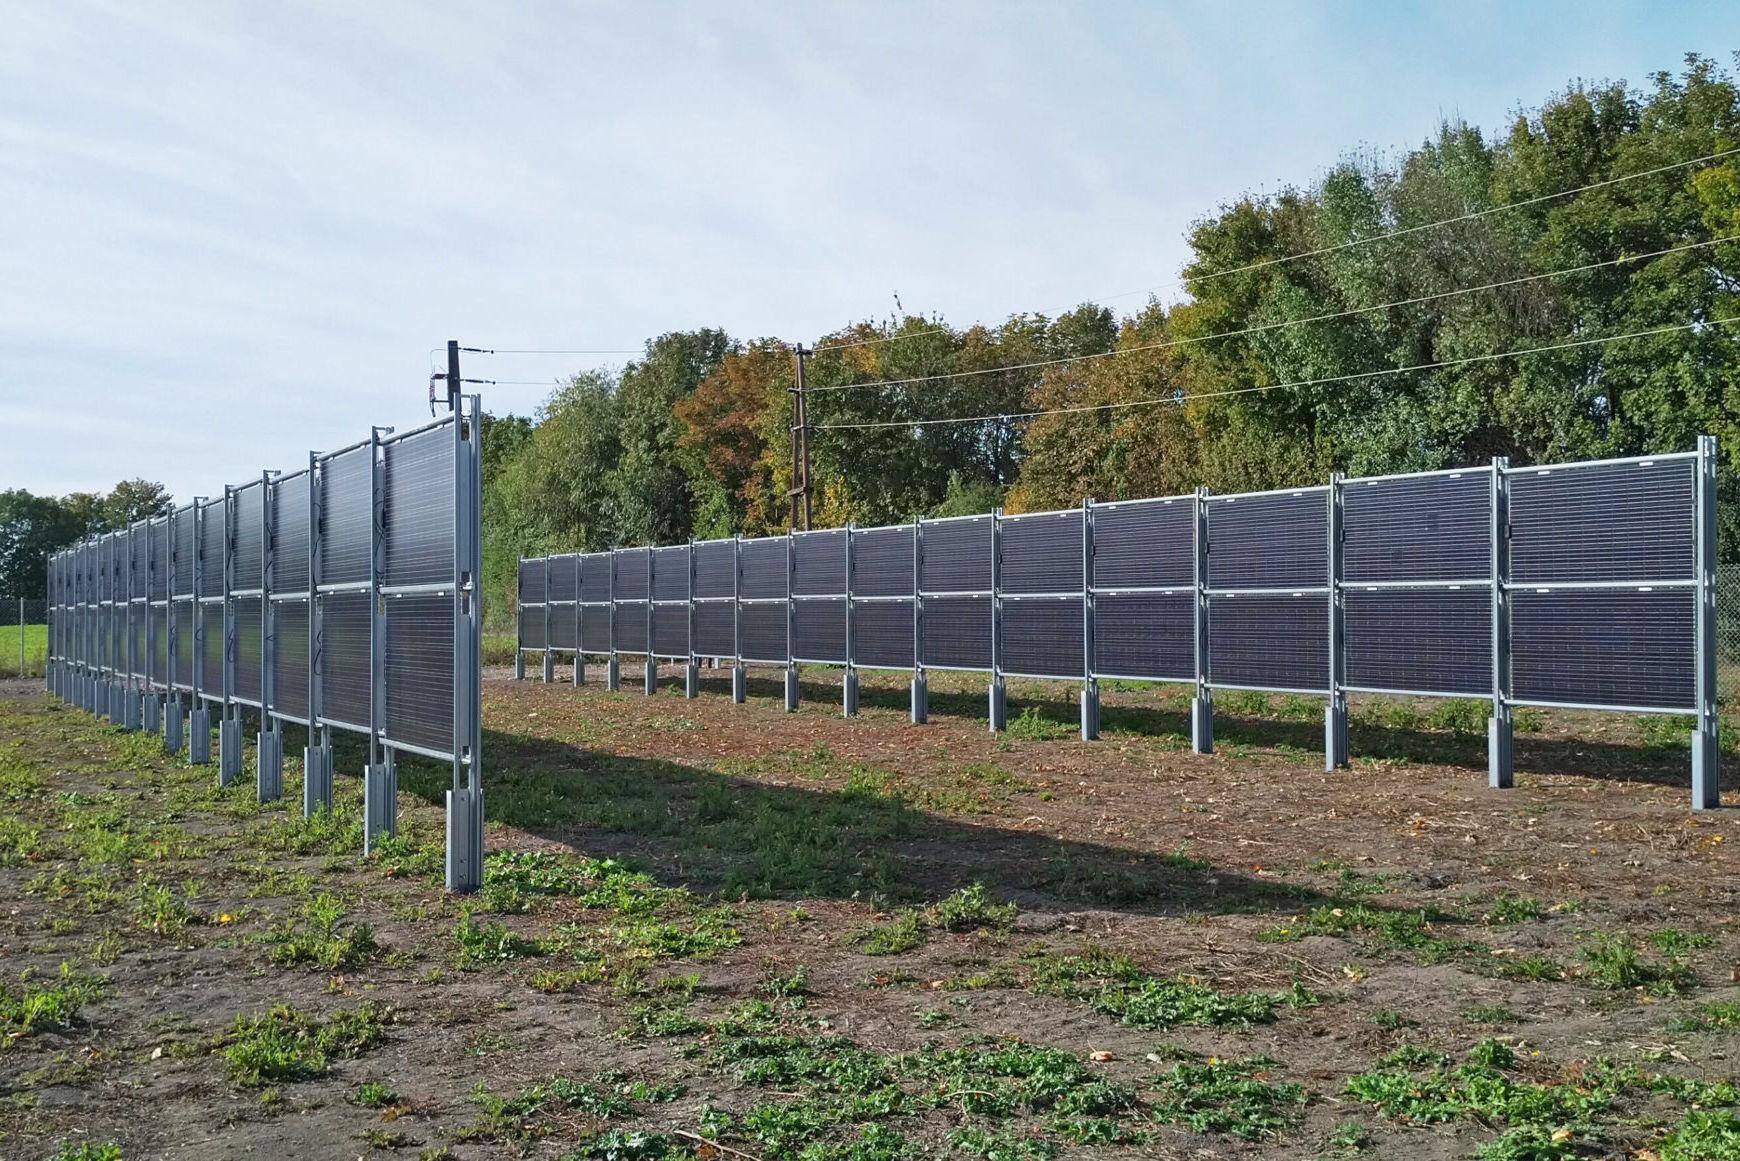 Agrar-Photovoltaikanlage Guntramsdorf